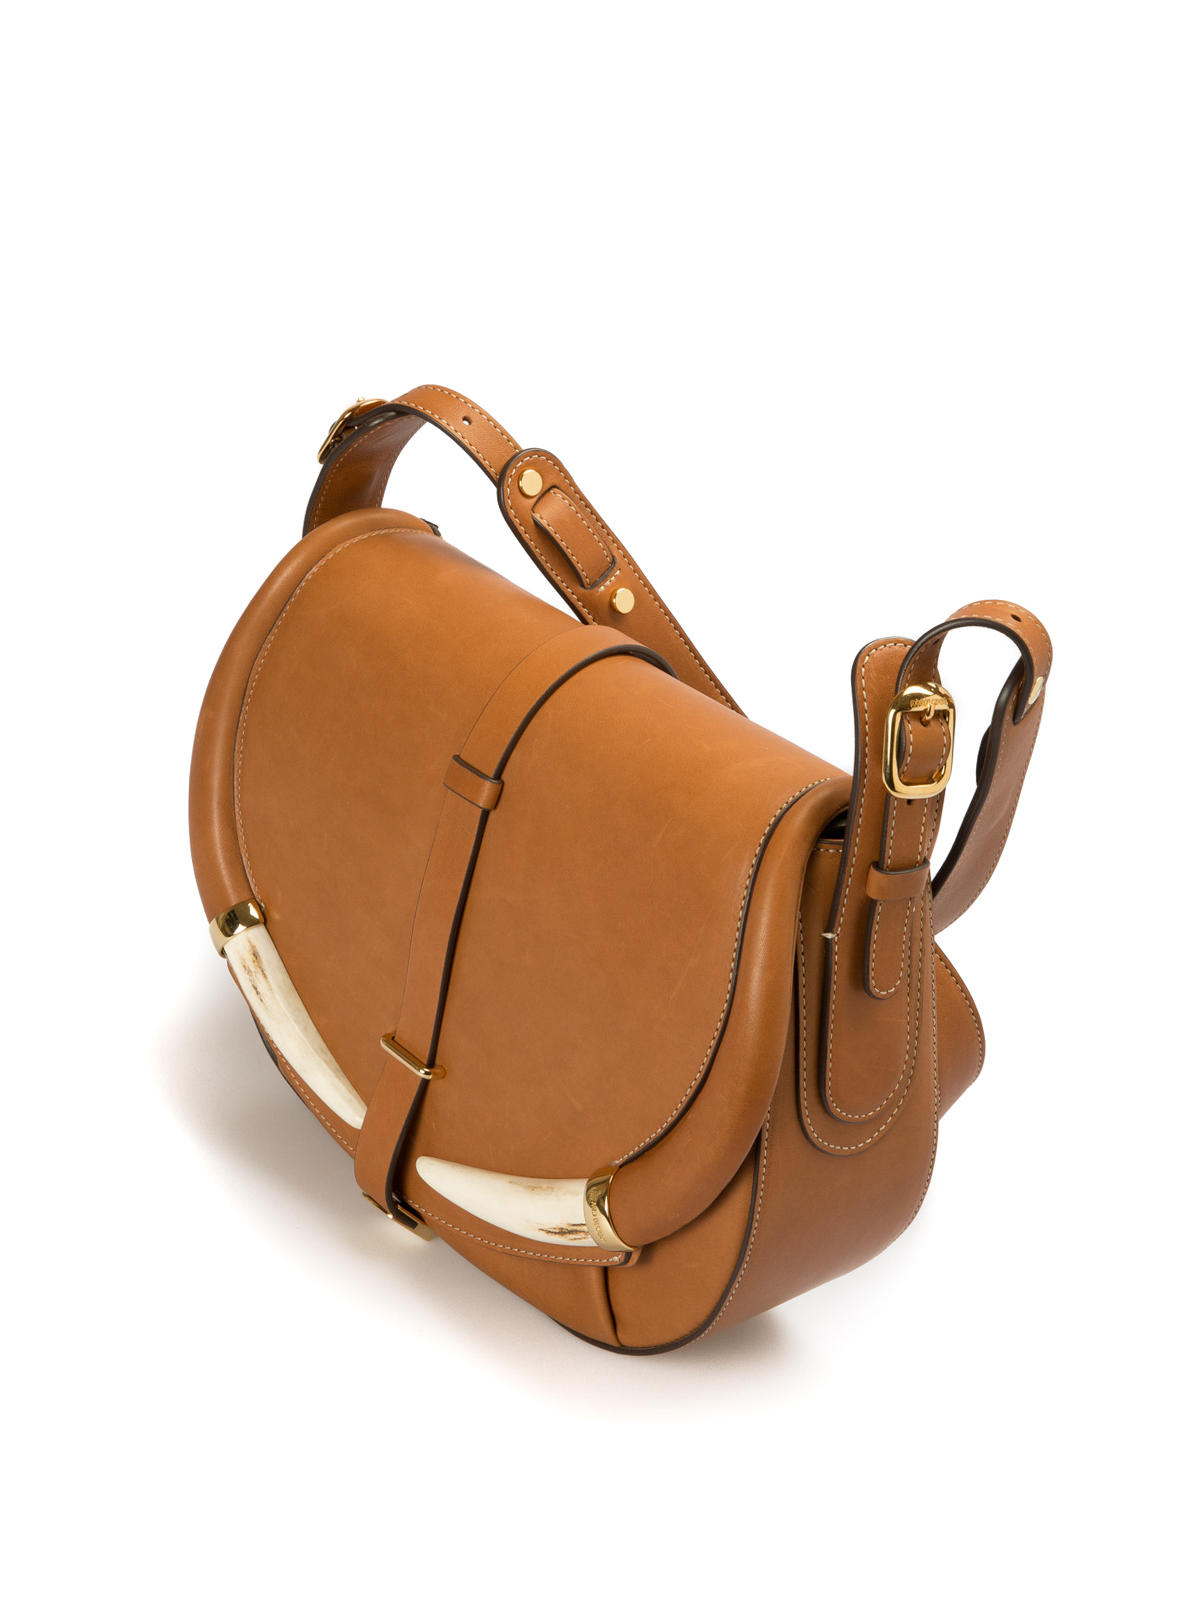 84e3b3c711c6 ROBERTO CAVALLI  shoulder bags online - Smooth leather horn detailed bag